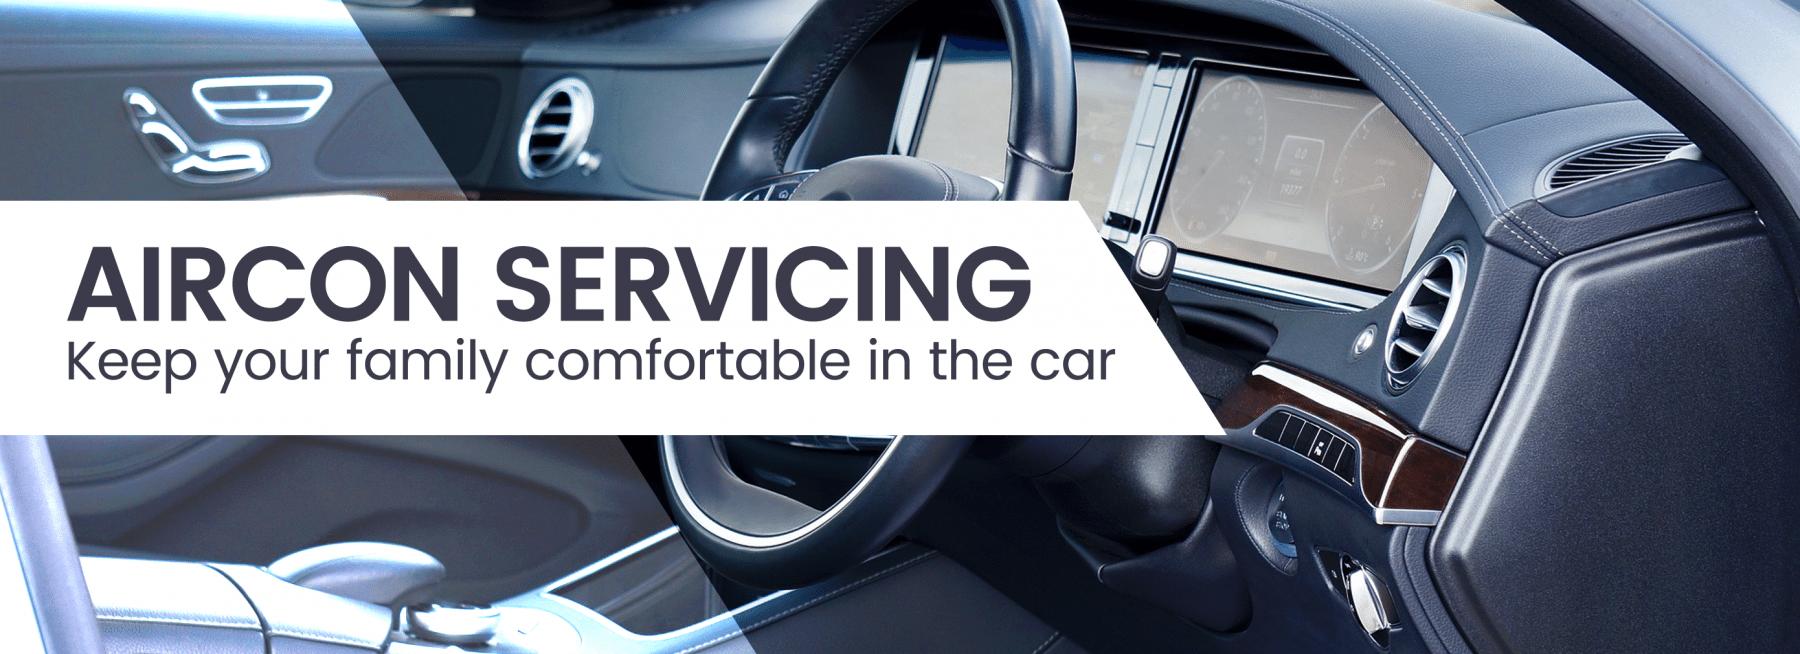 Air Con Servicing - Sandgate Auto Electrics